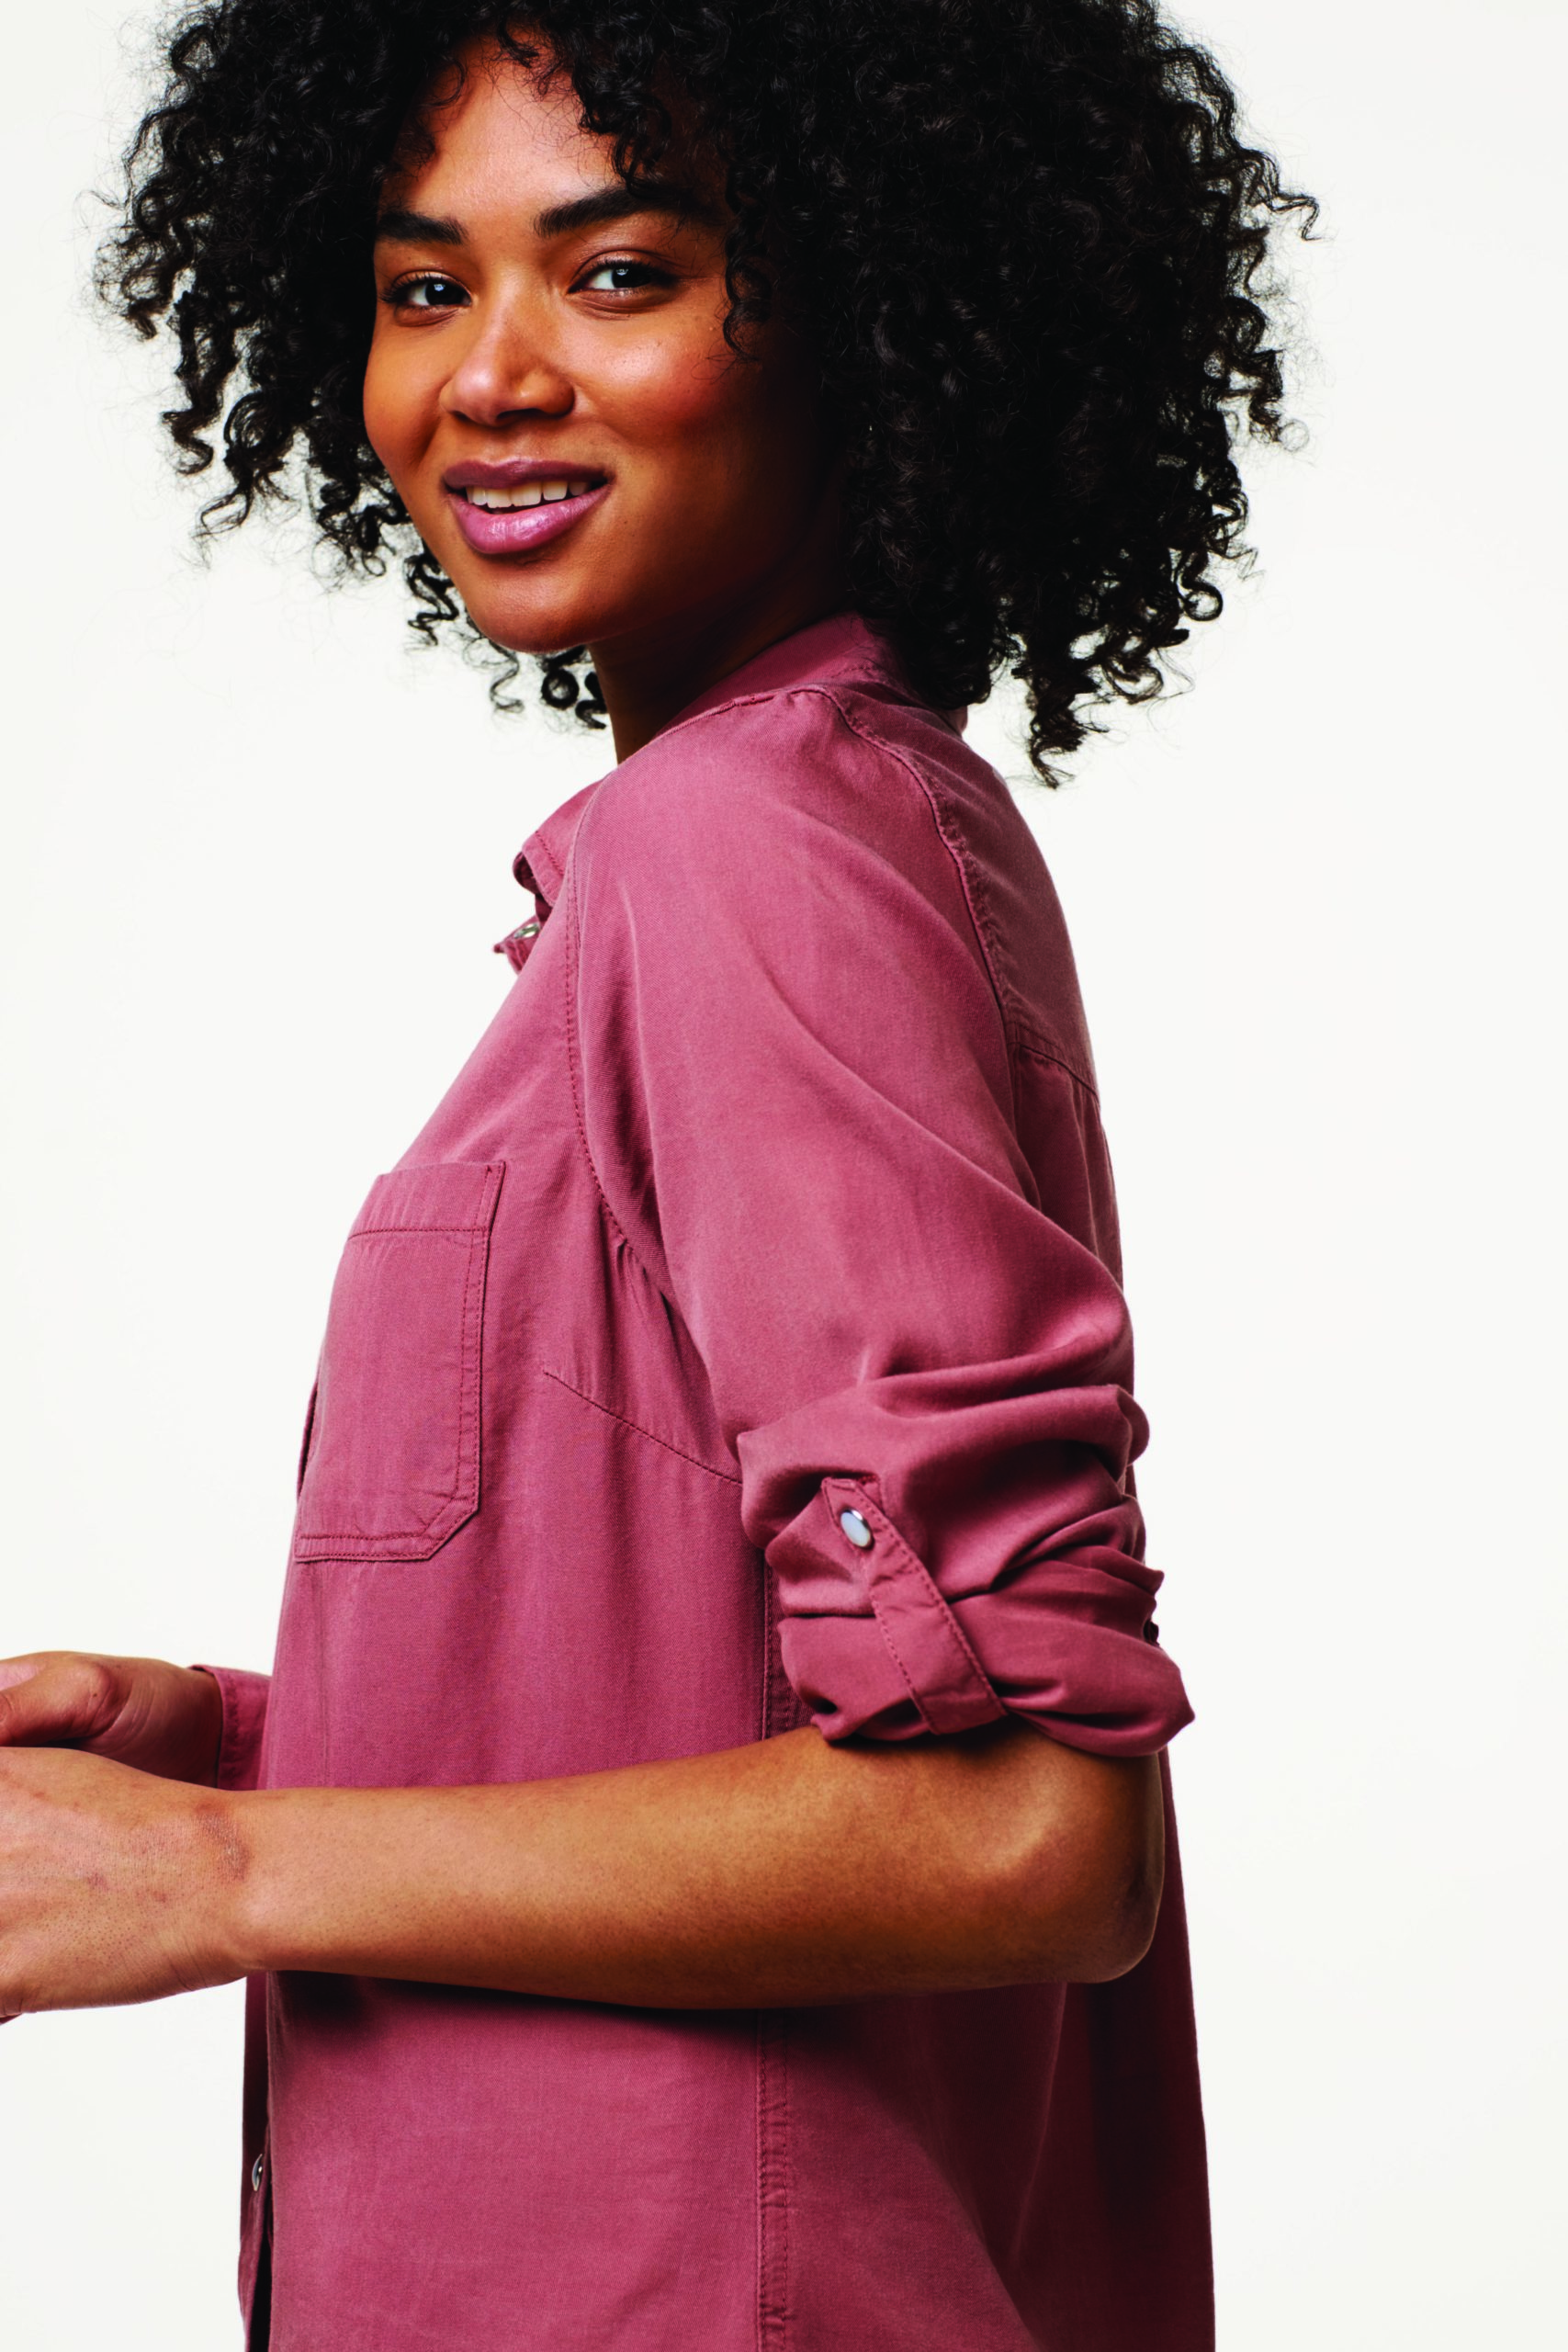 Dosis duurzame mode bij HEMA